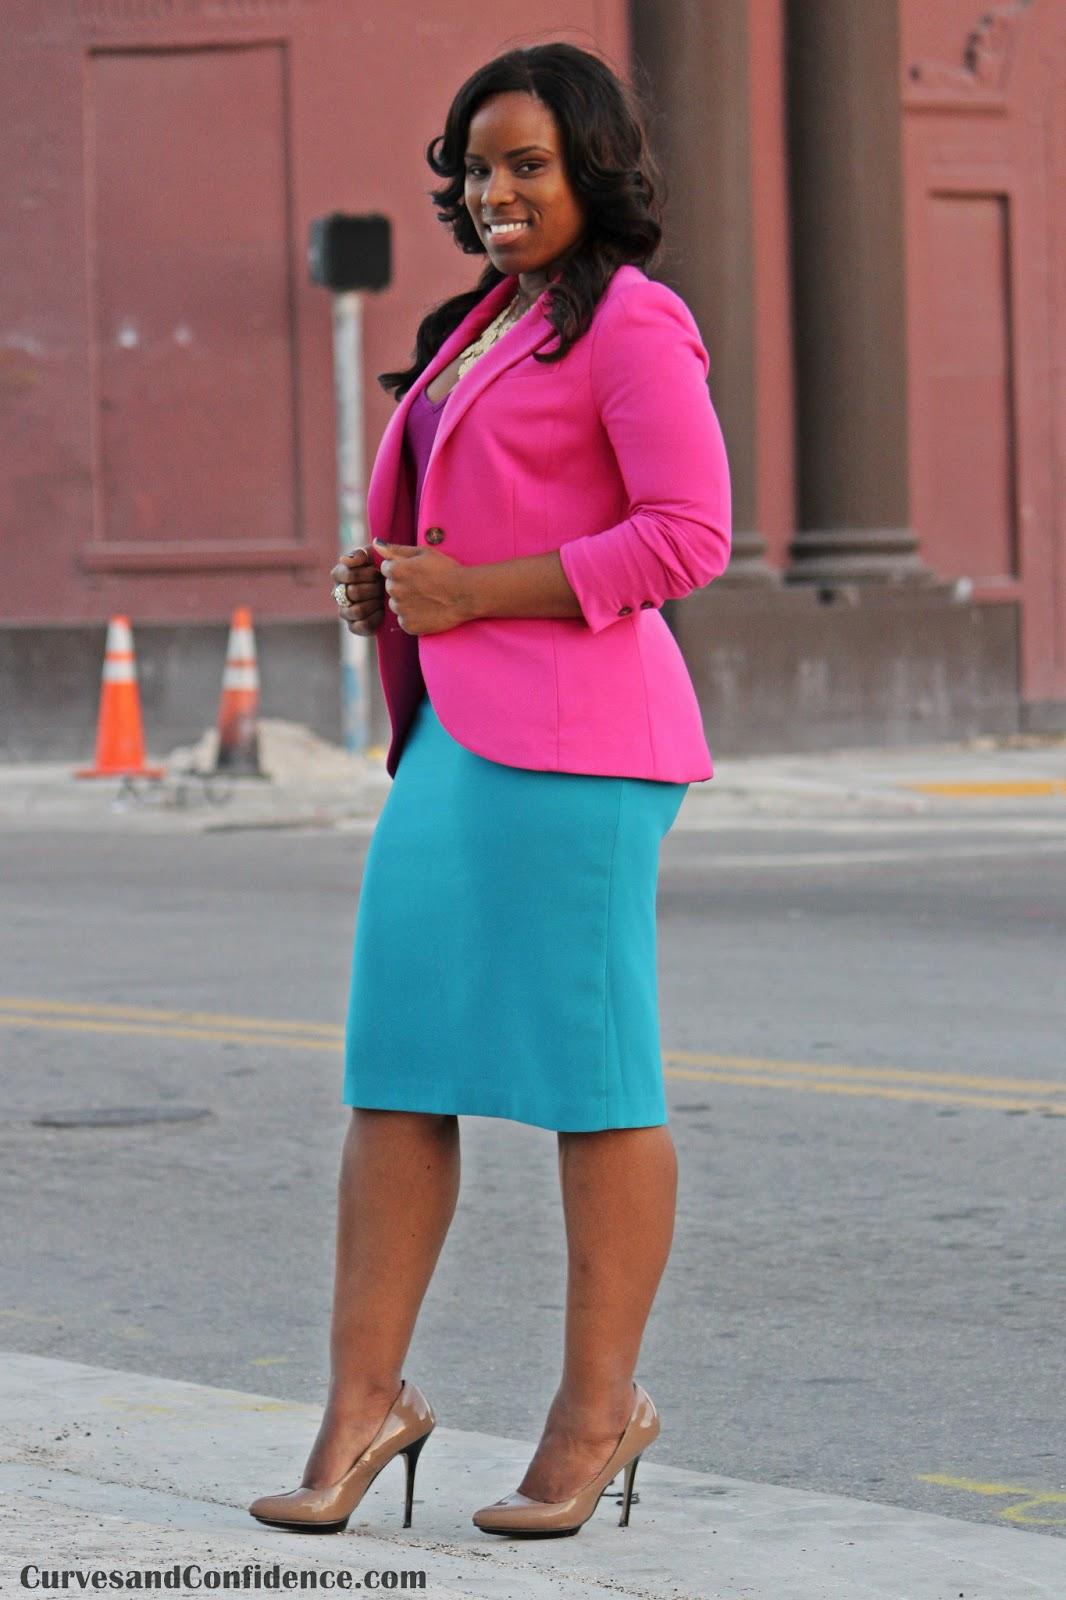 http://2.bp.blogspot.com/-VsOjRaBGtUI/UO7QBChuEGI/AAAAAAAAEOo/TToZpVhZcAs/s1600/blue+pencil+skirt,+pink+blazer,+plum+tank+top,+curvy+fashion+blogger,+curvy+confidence,+how+to+wear+work+clothes+confidently,+sexy+office+outfits.JPG